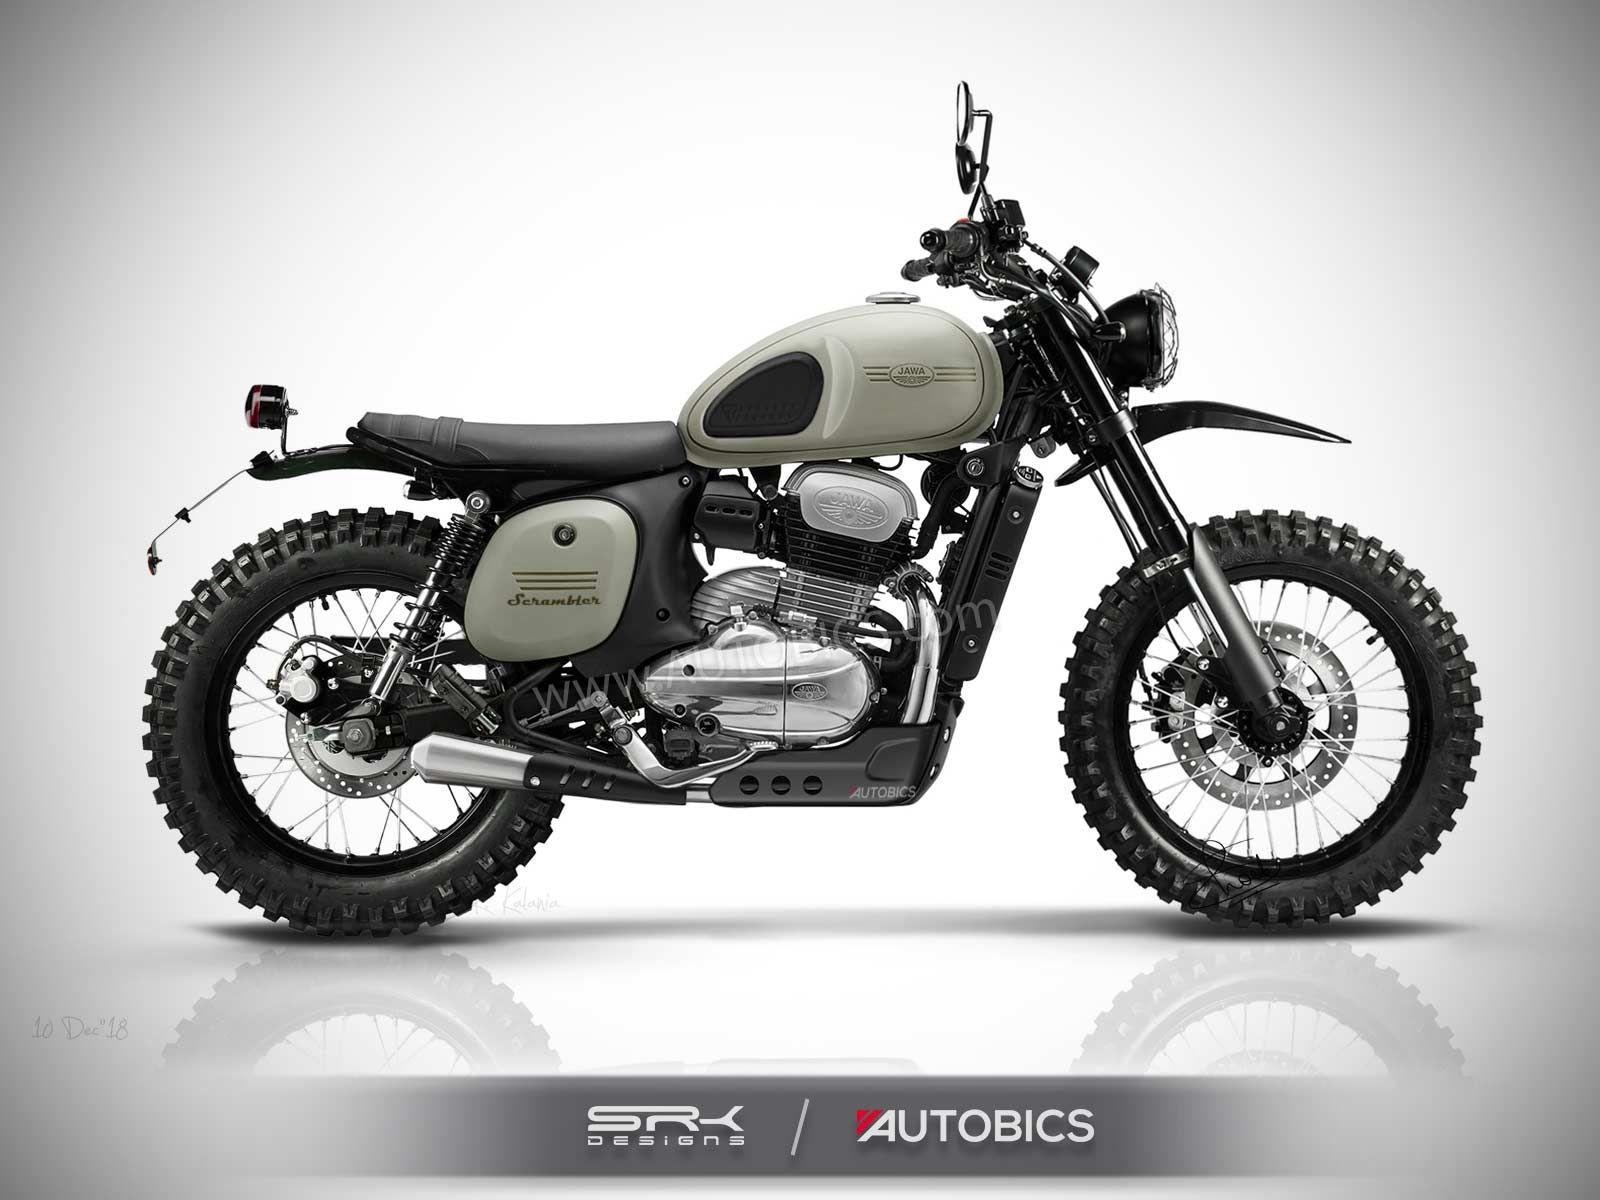 Jawa Scrambler Concept Motorcycle Imagined Rendering Concept